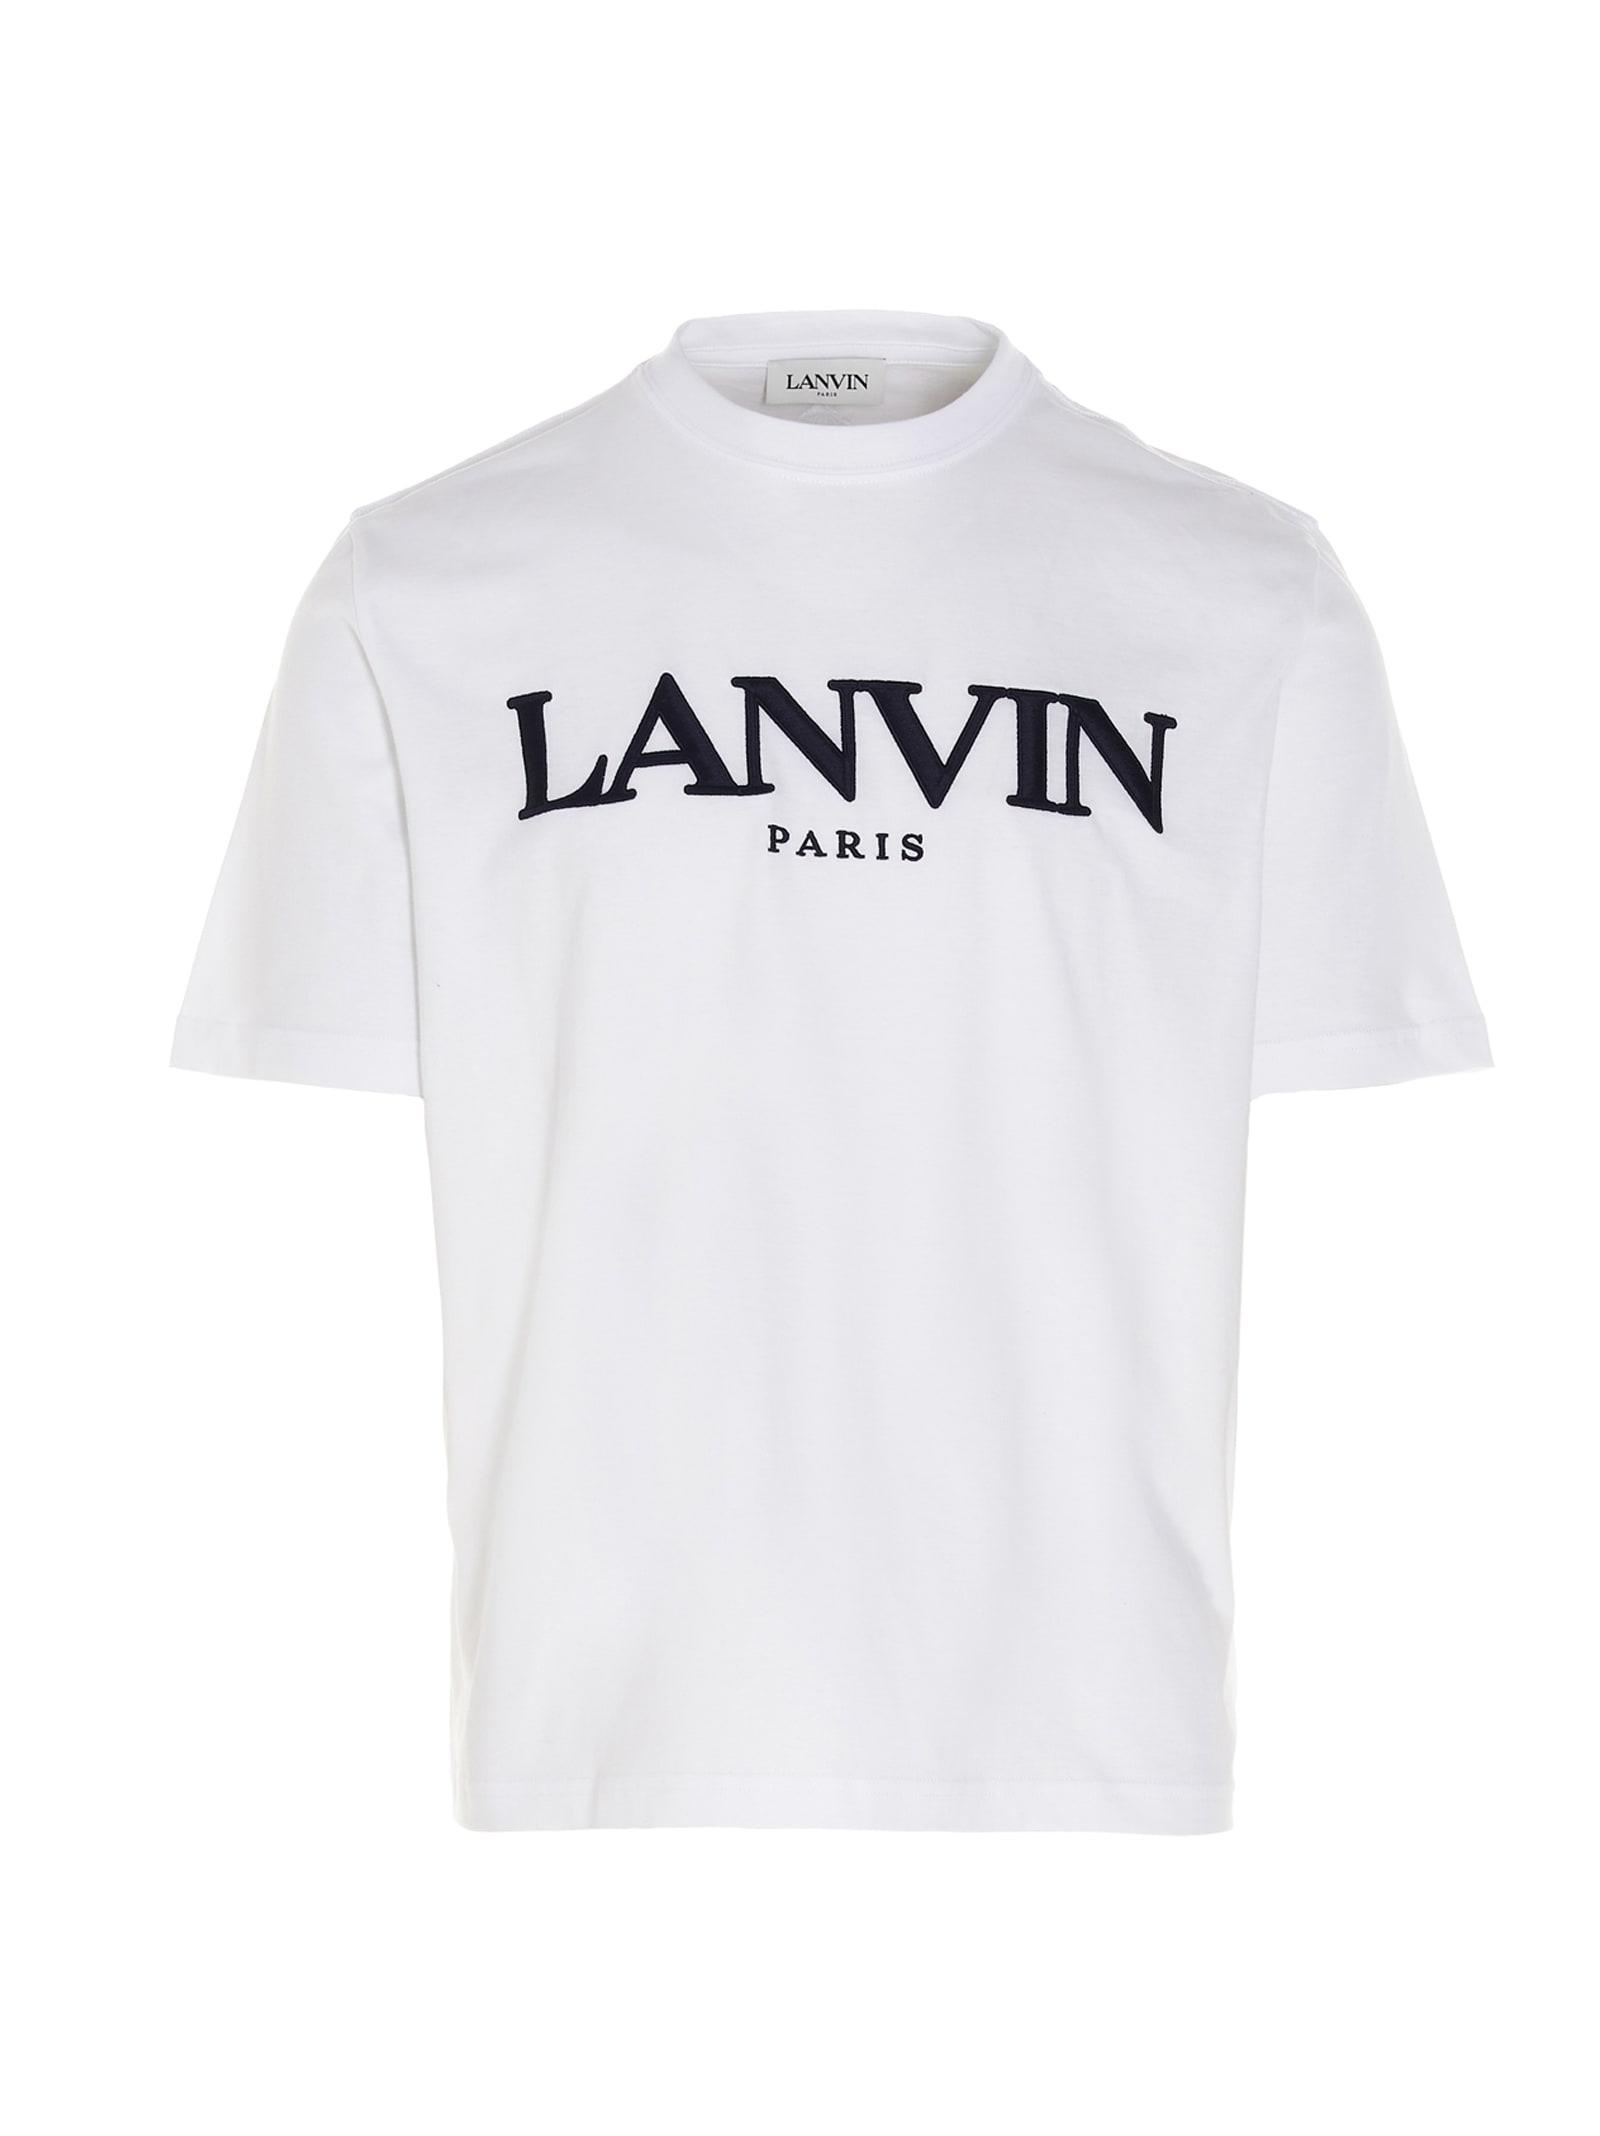 Lanvin T-SHIRT